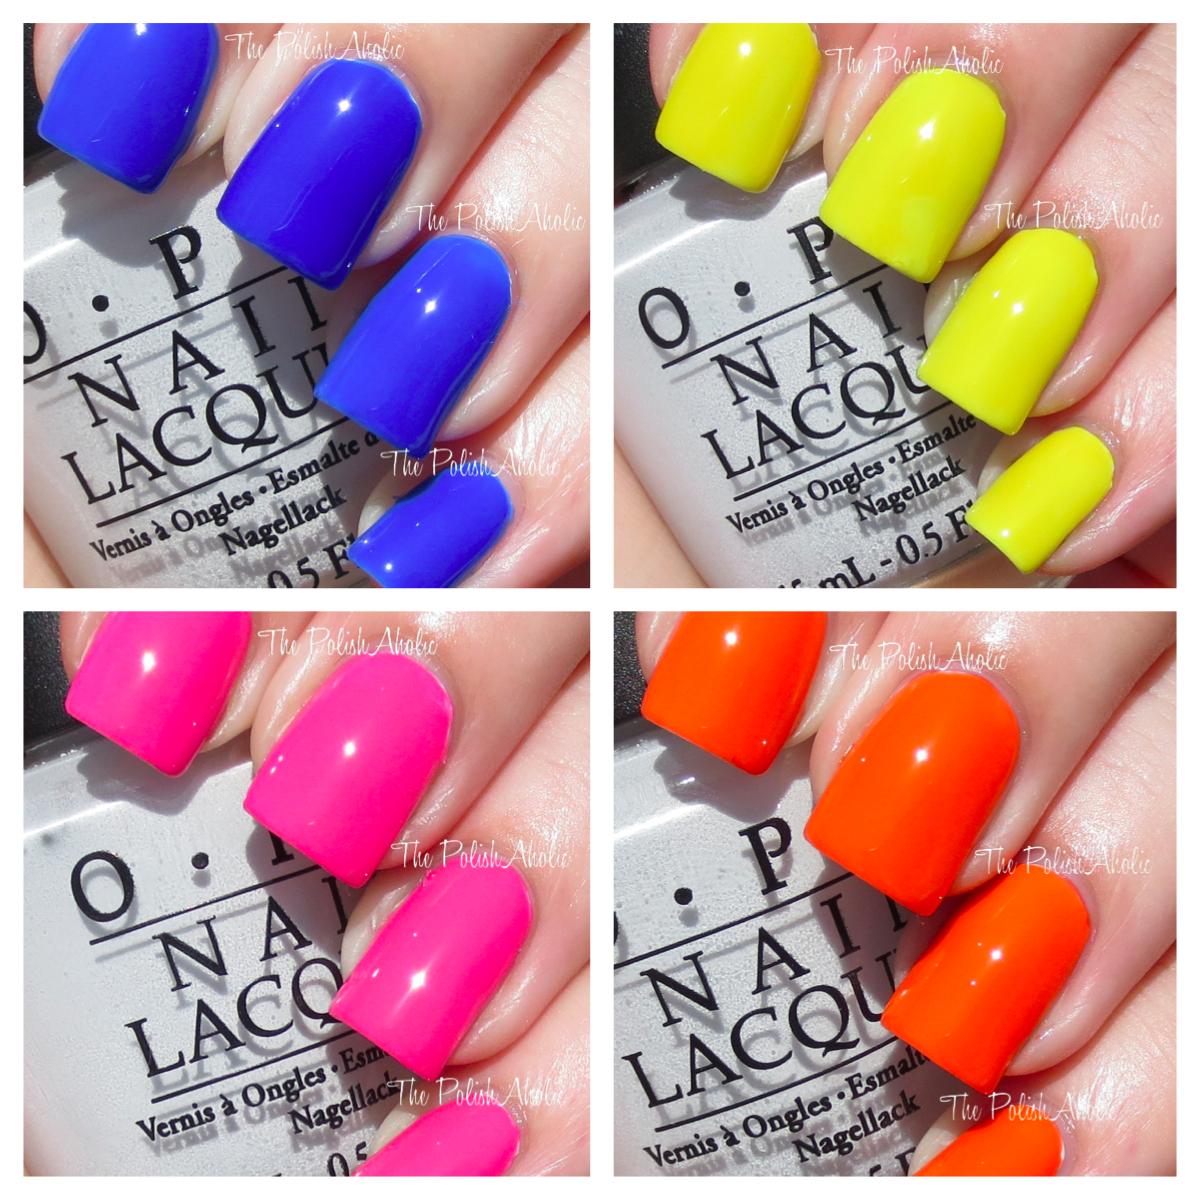 the polishaholic opi neon revolution mini set swatches review